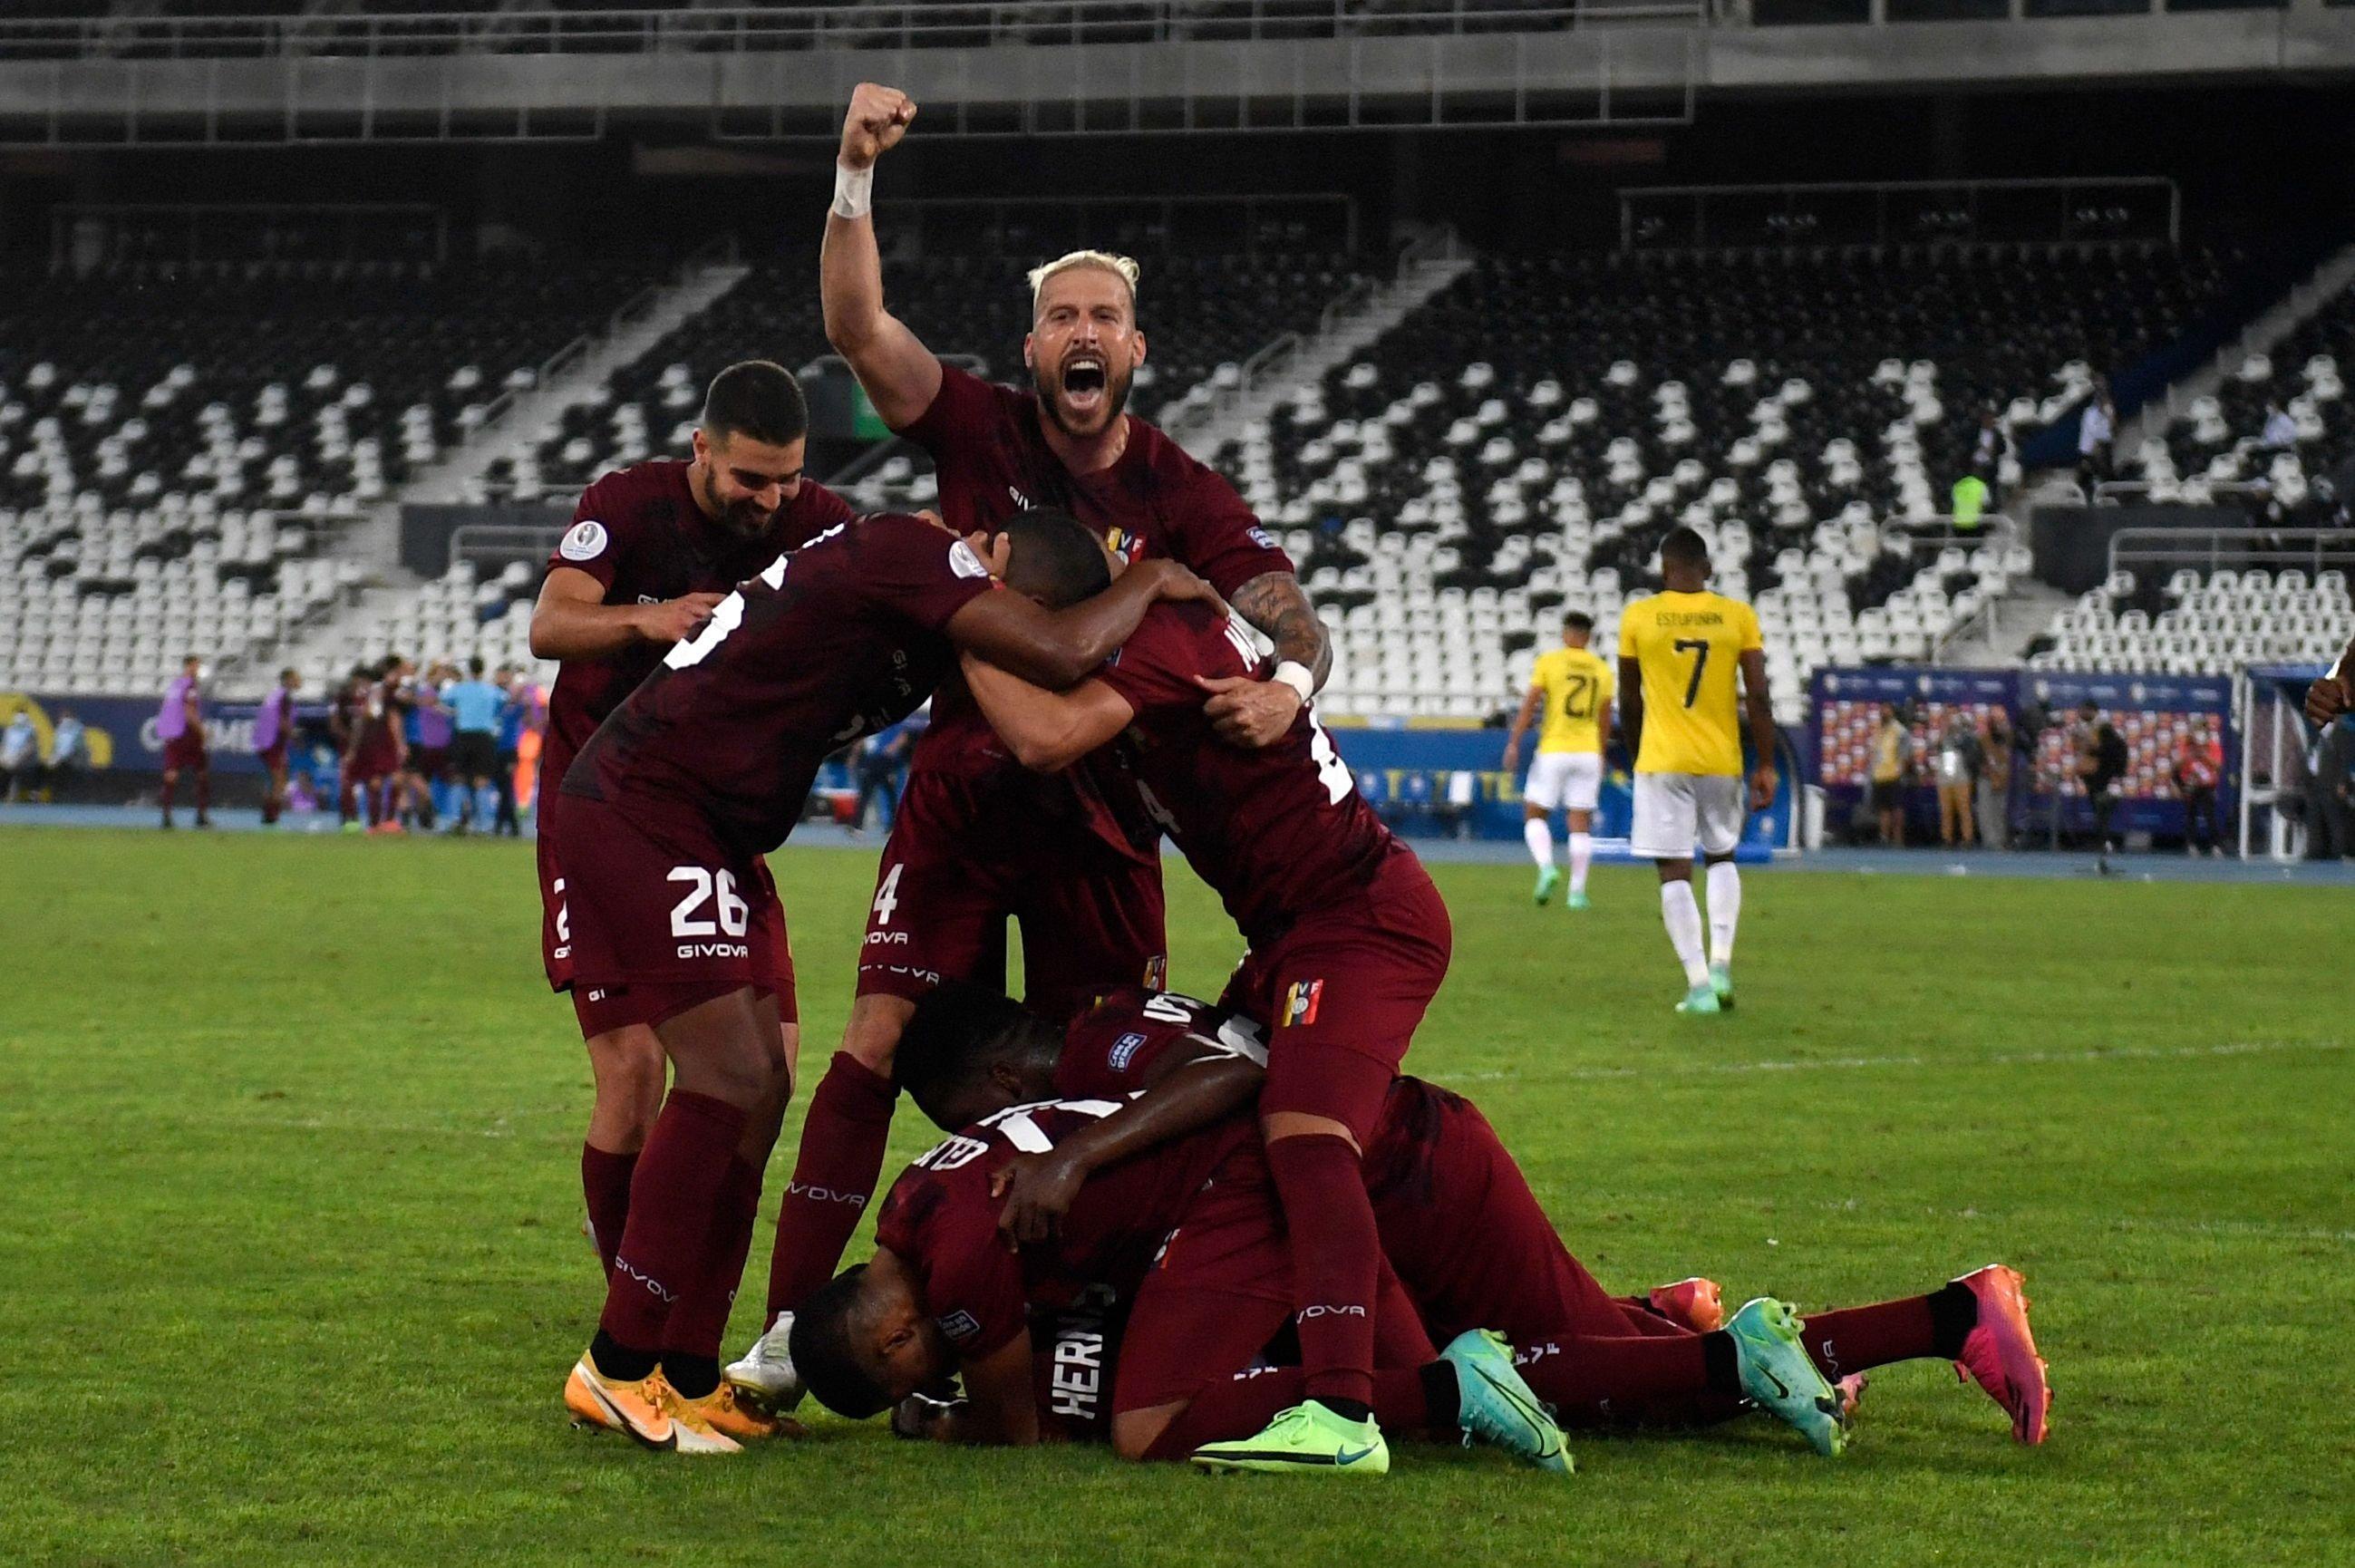 Venezuela players celebrate after scoring against Ecuador during their Copa America 2021 group match at the Nilton Santos Stadium in Rio de Janeiro, Brazil, June 20, 2021. (AFP Photo)